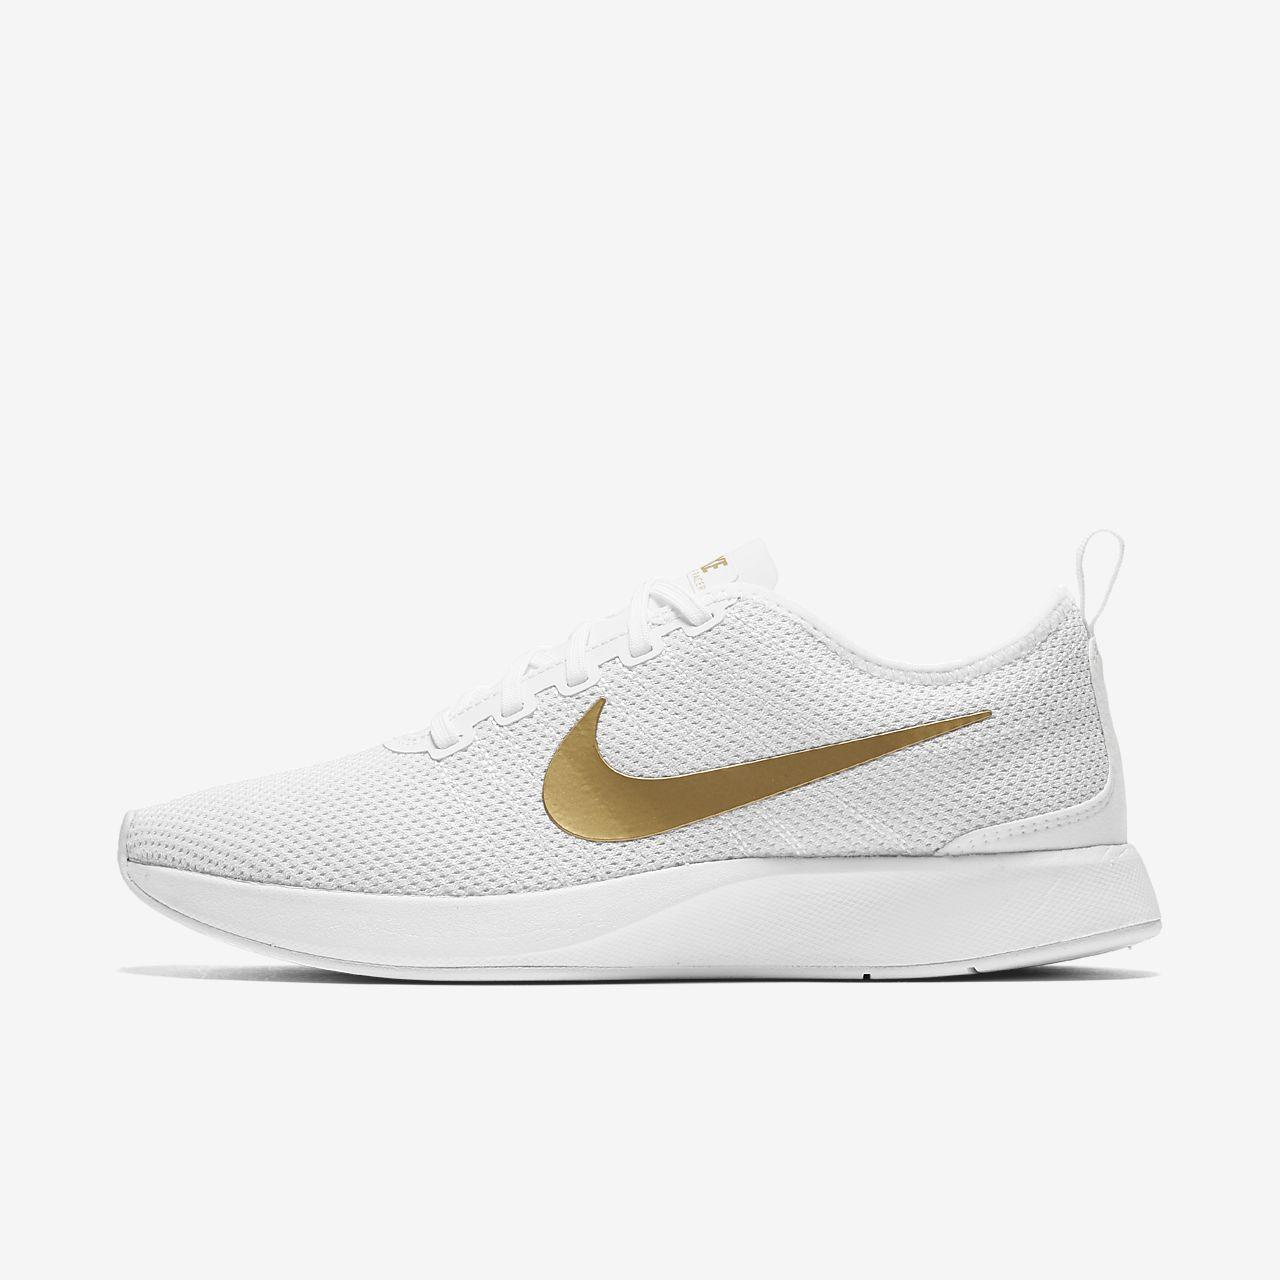 Chaussures Nike Racer beiges femme sXFTIOfDeZ